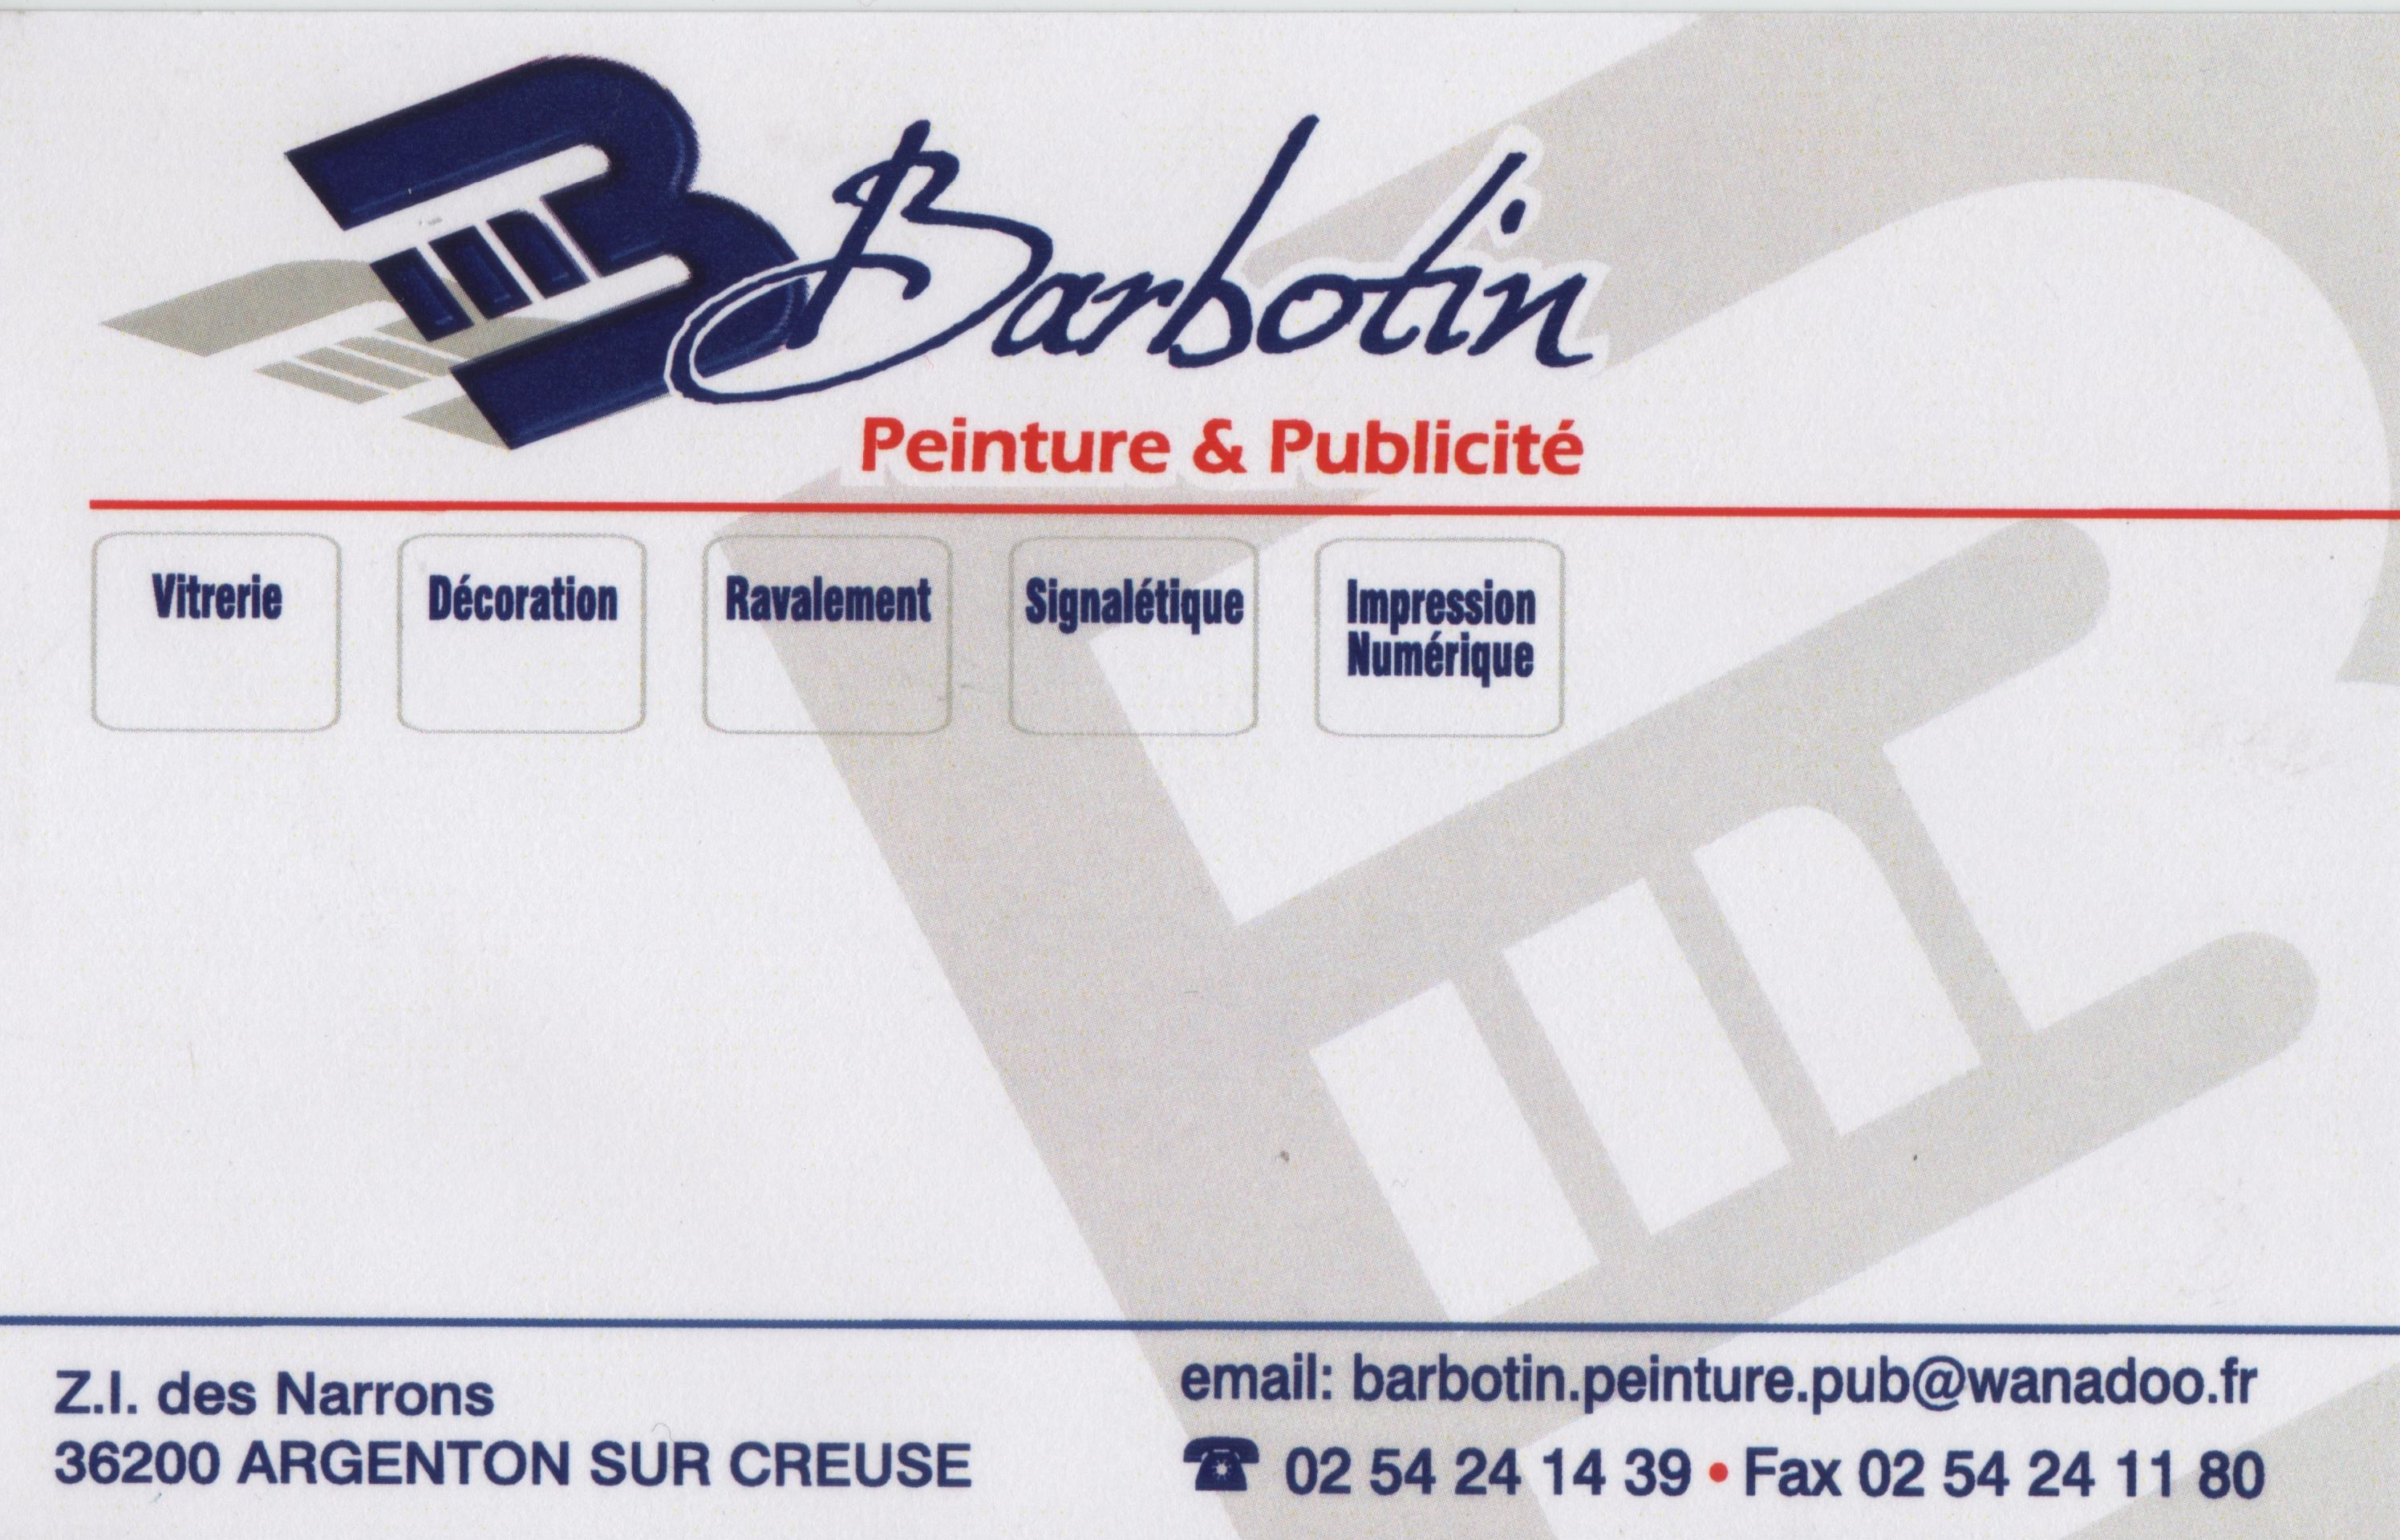 Barbotin